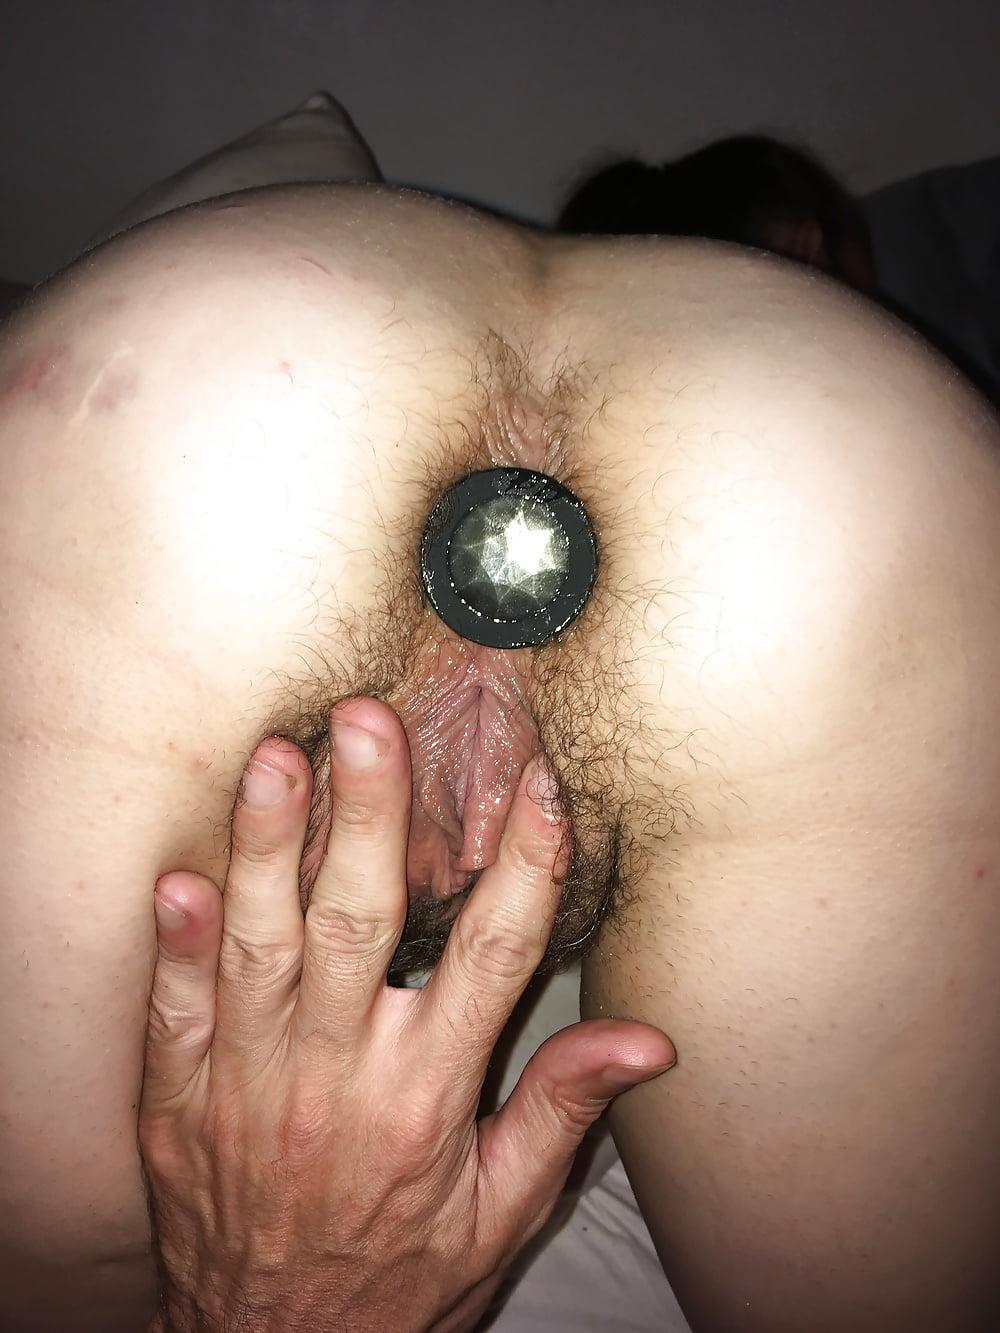 Best remote butt plug-5382